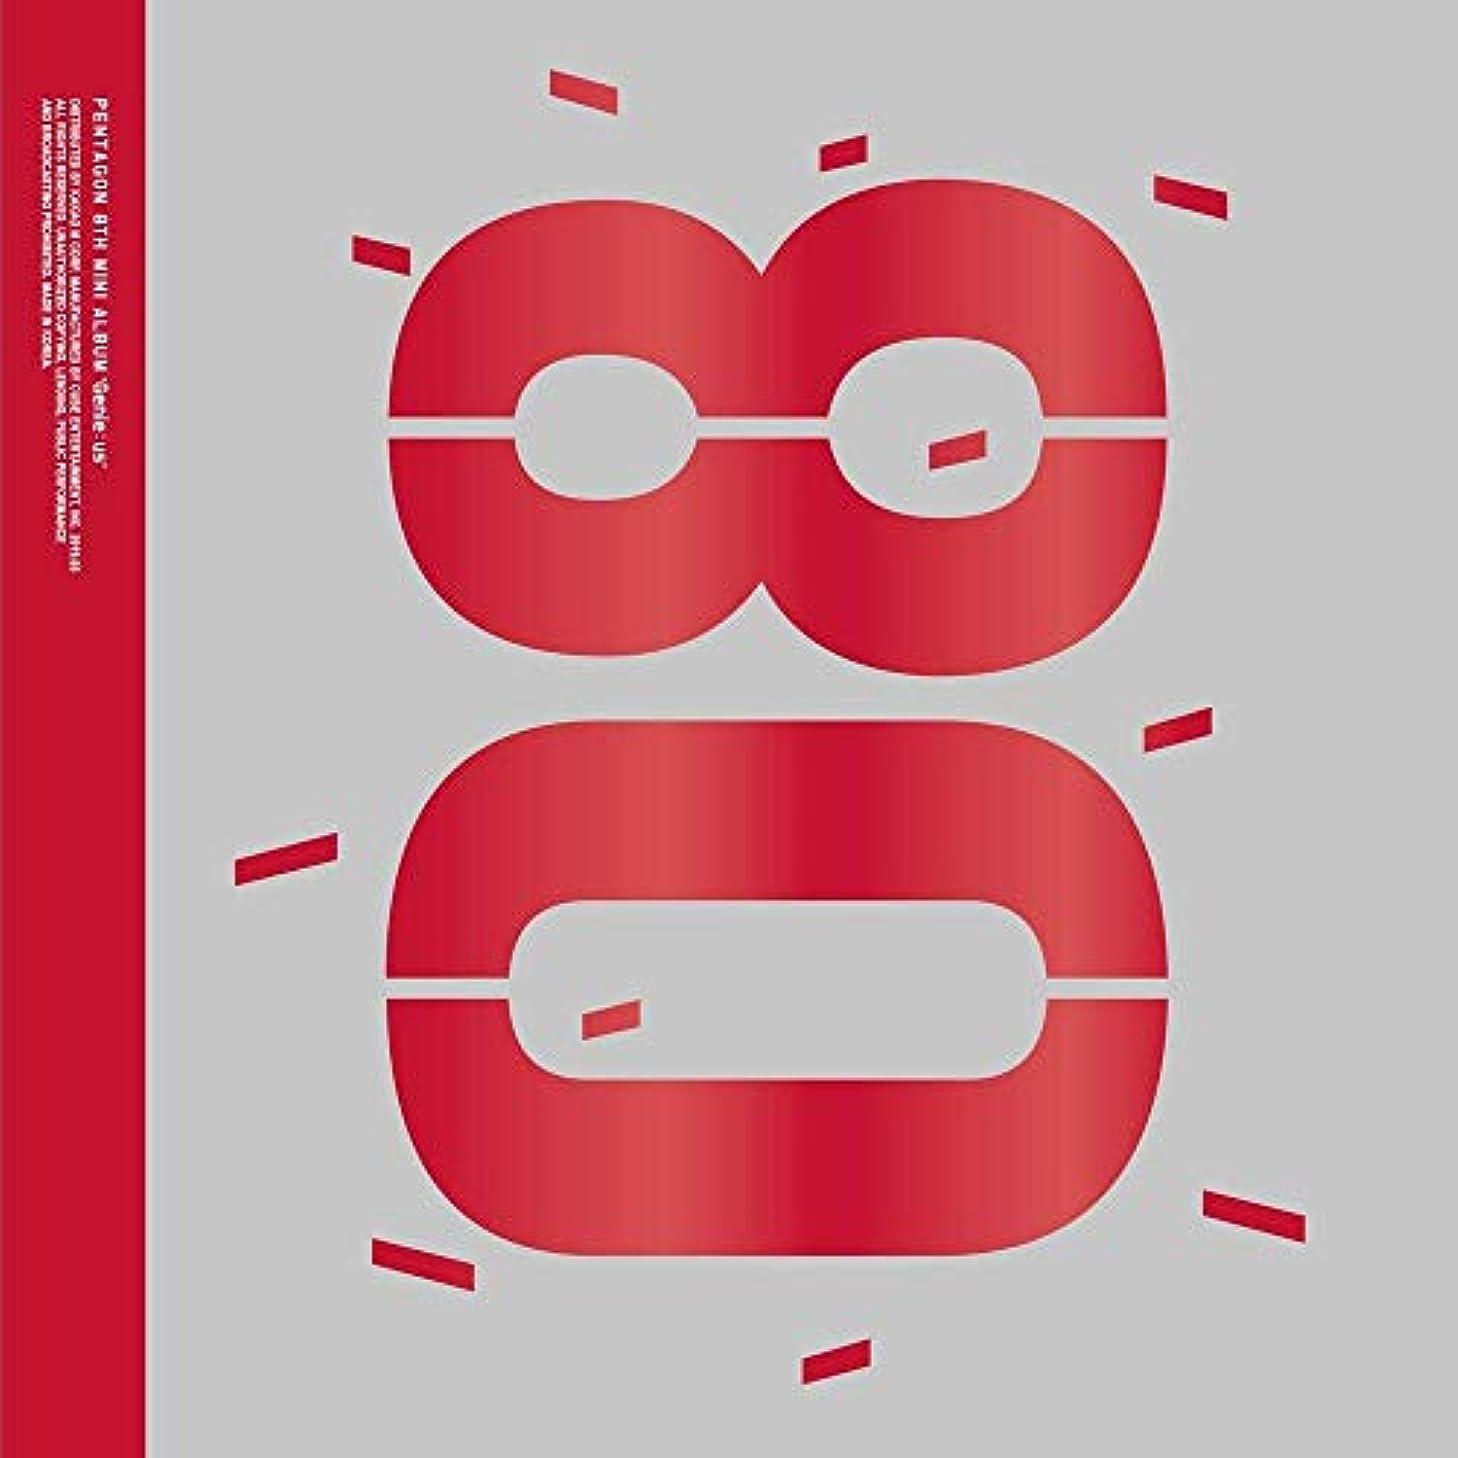 CUBE Entertainment Pentagon - Genie:us (8th Mini Album) 1 CD+Booklet+1 Postcard+1 Official Photocard